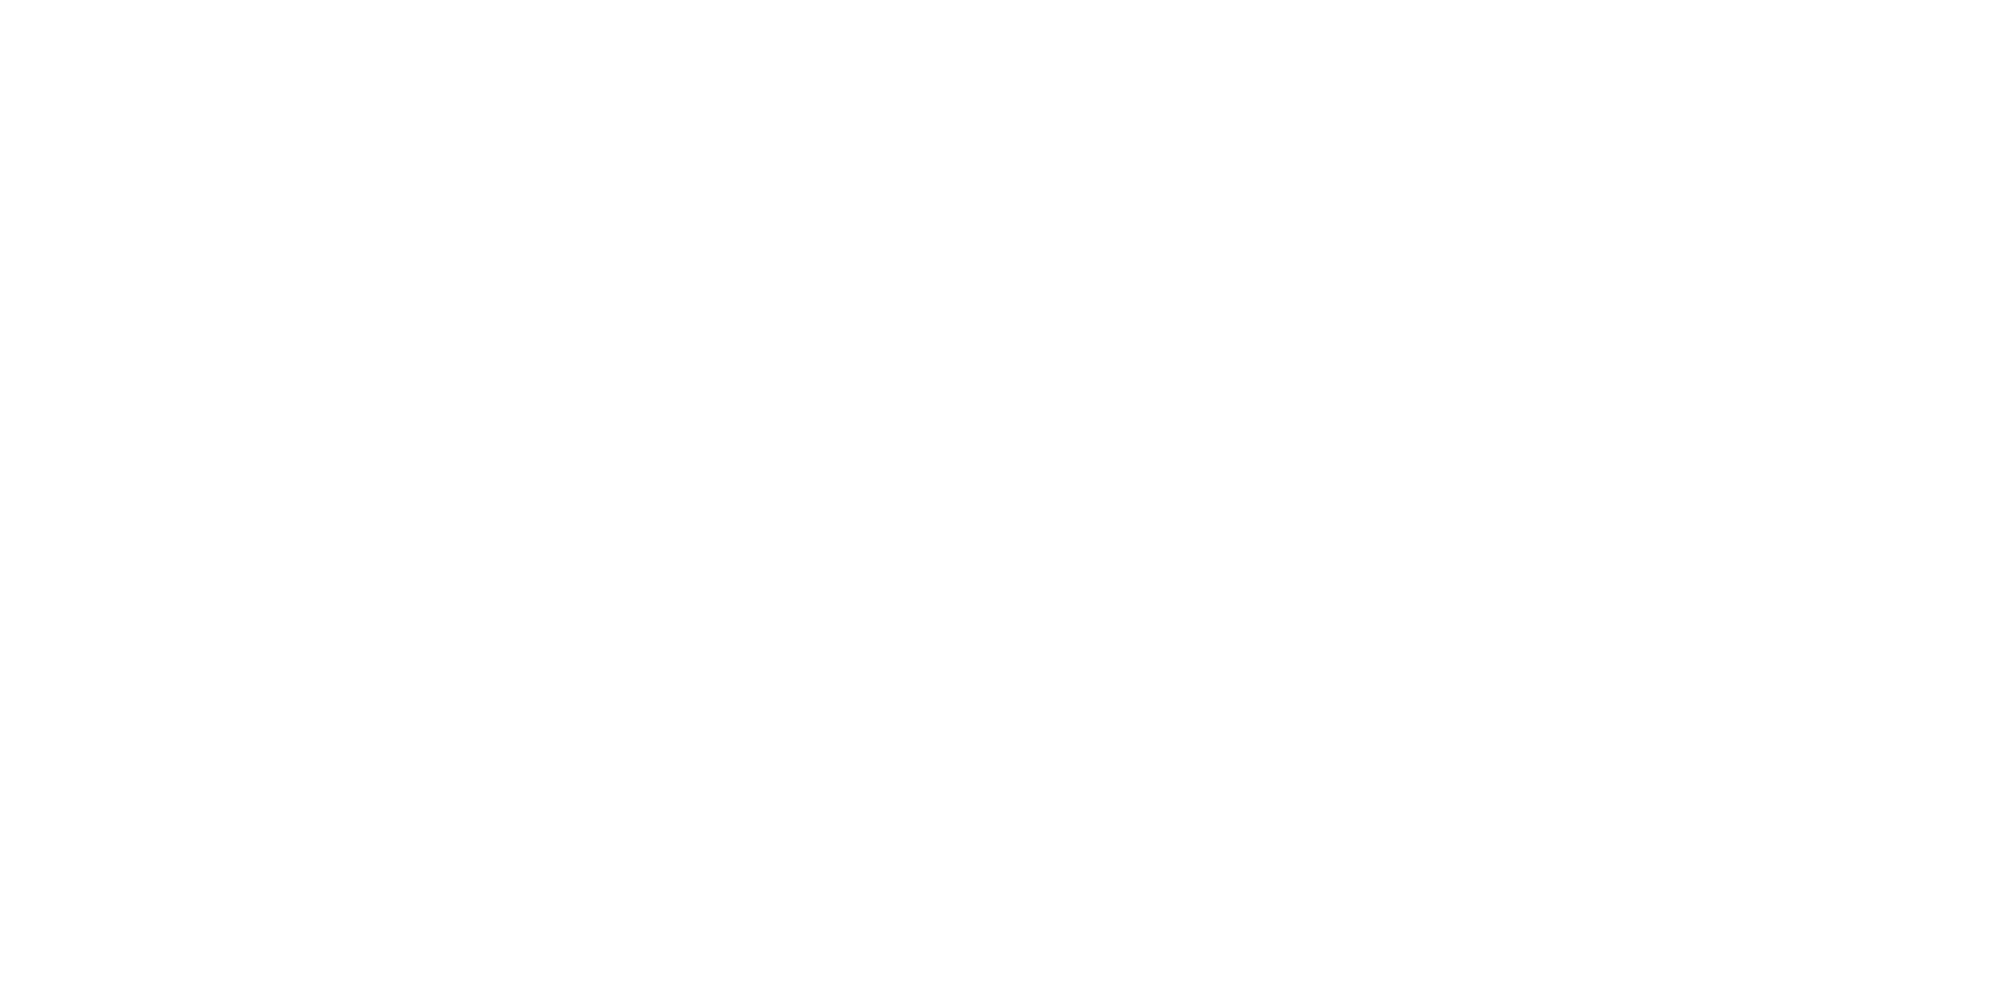 Lakeside Insurance star icon